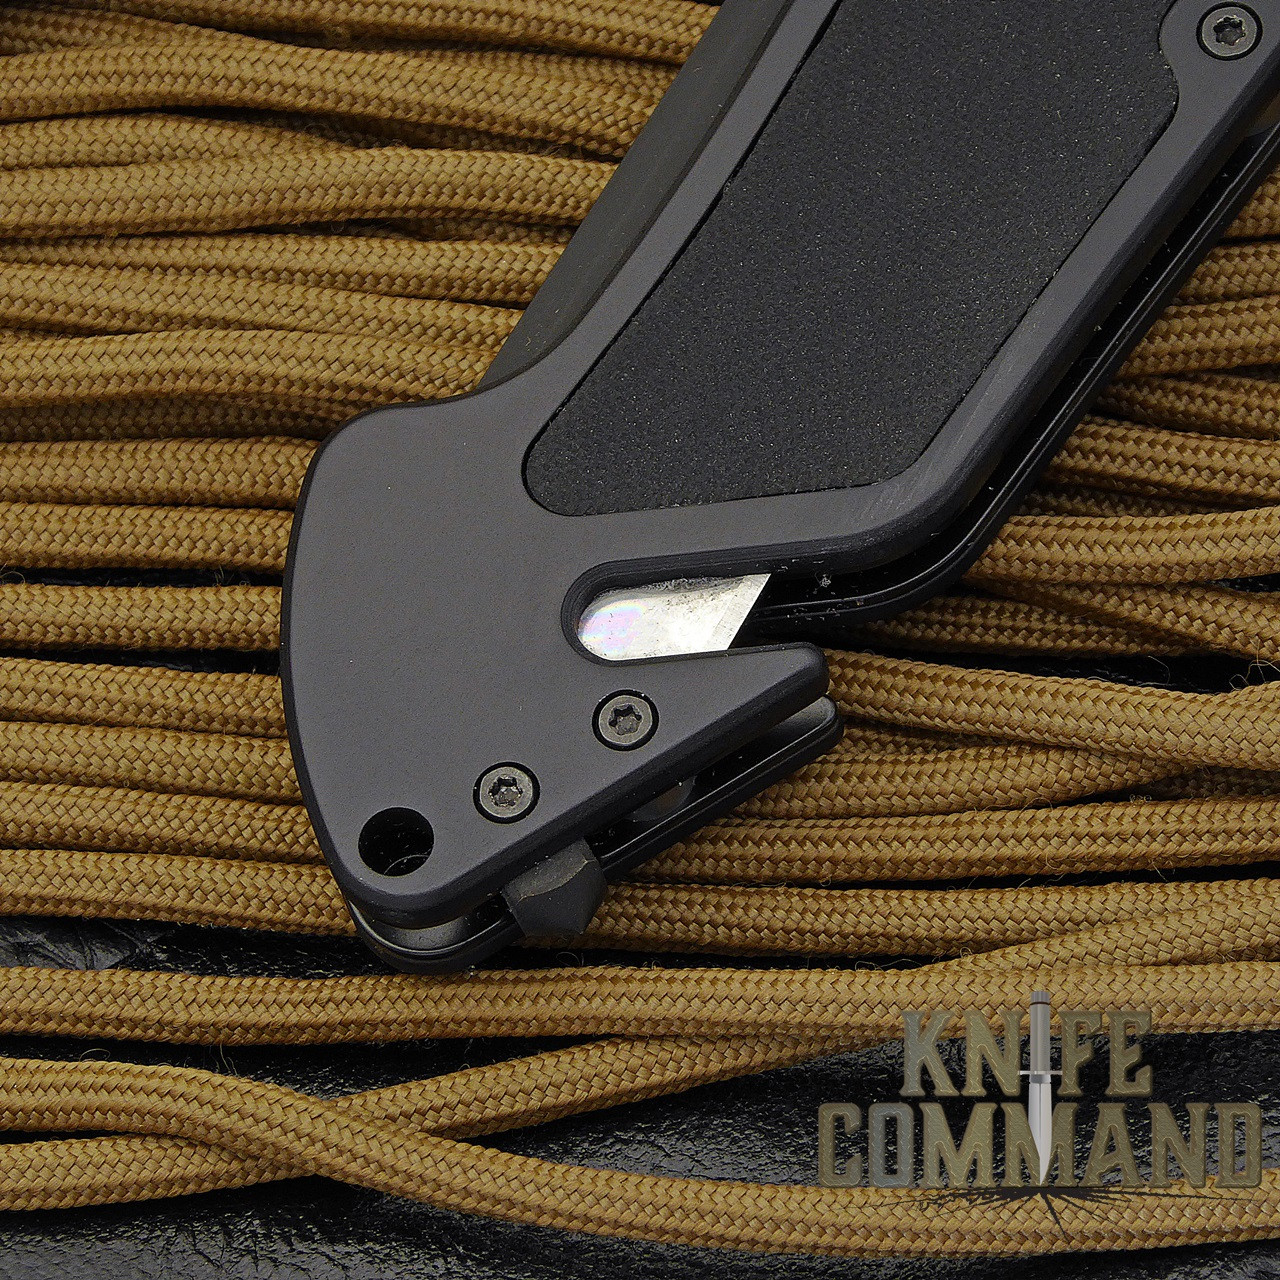 Eickhorn Solingen PRT VI Black Tactical Emergency Rescue Knife.  Emergency glass breaker and belt cutter.